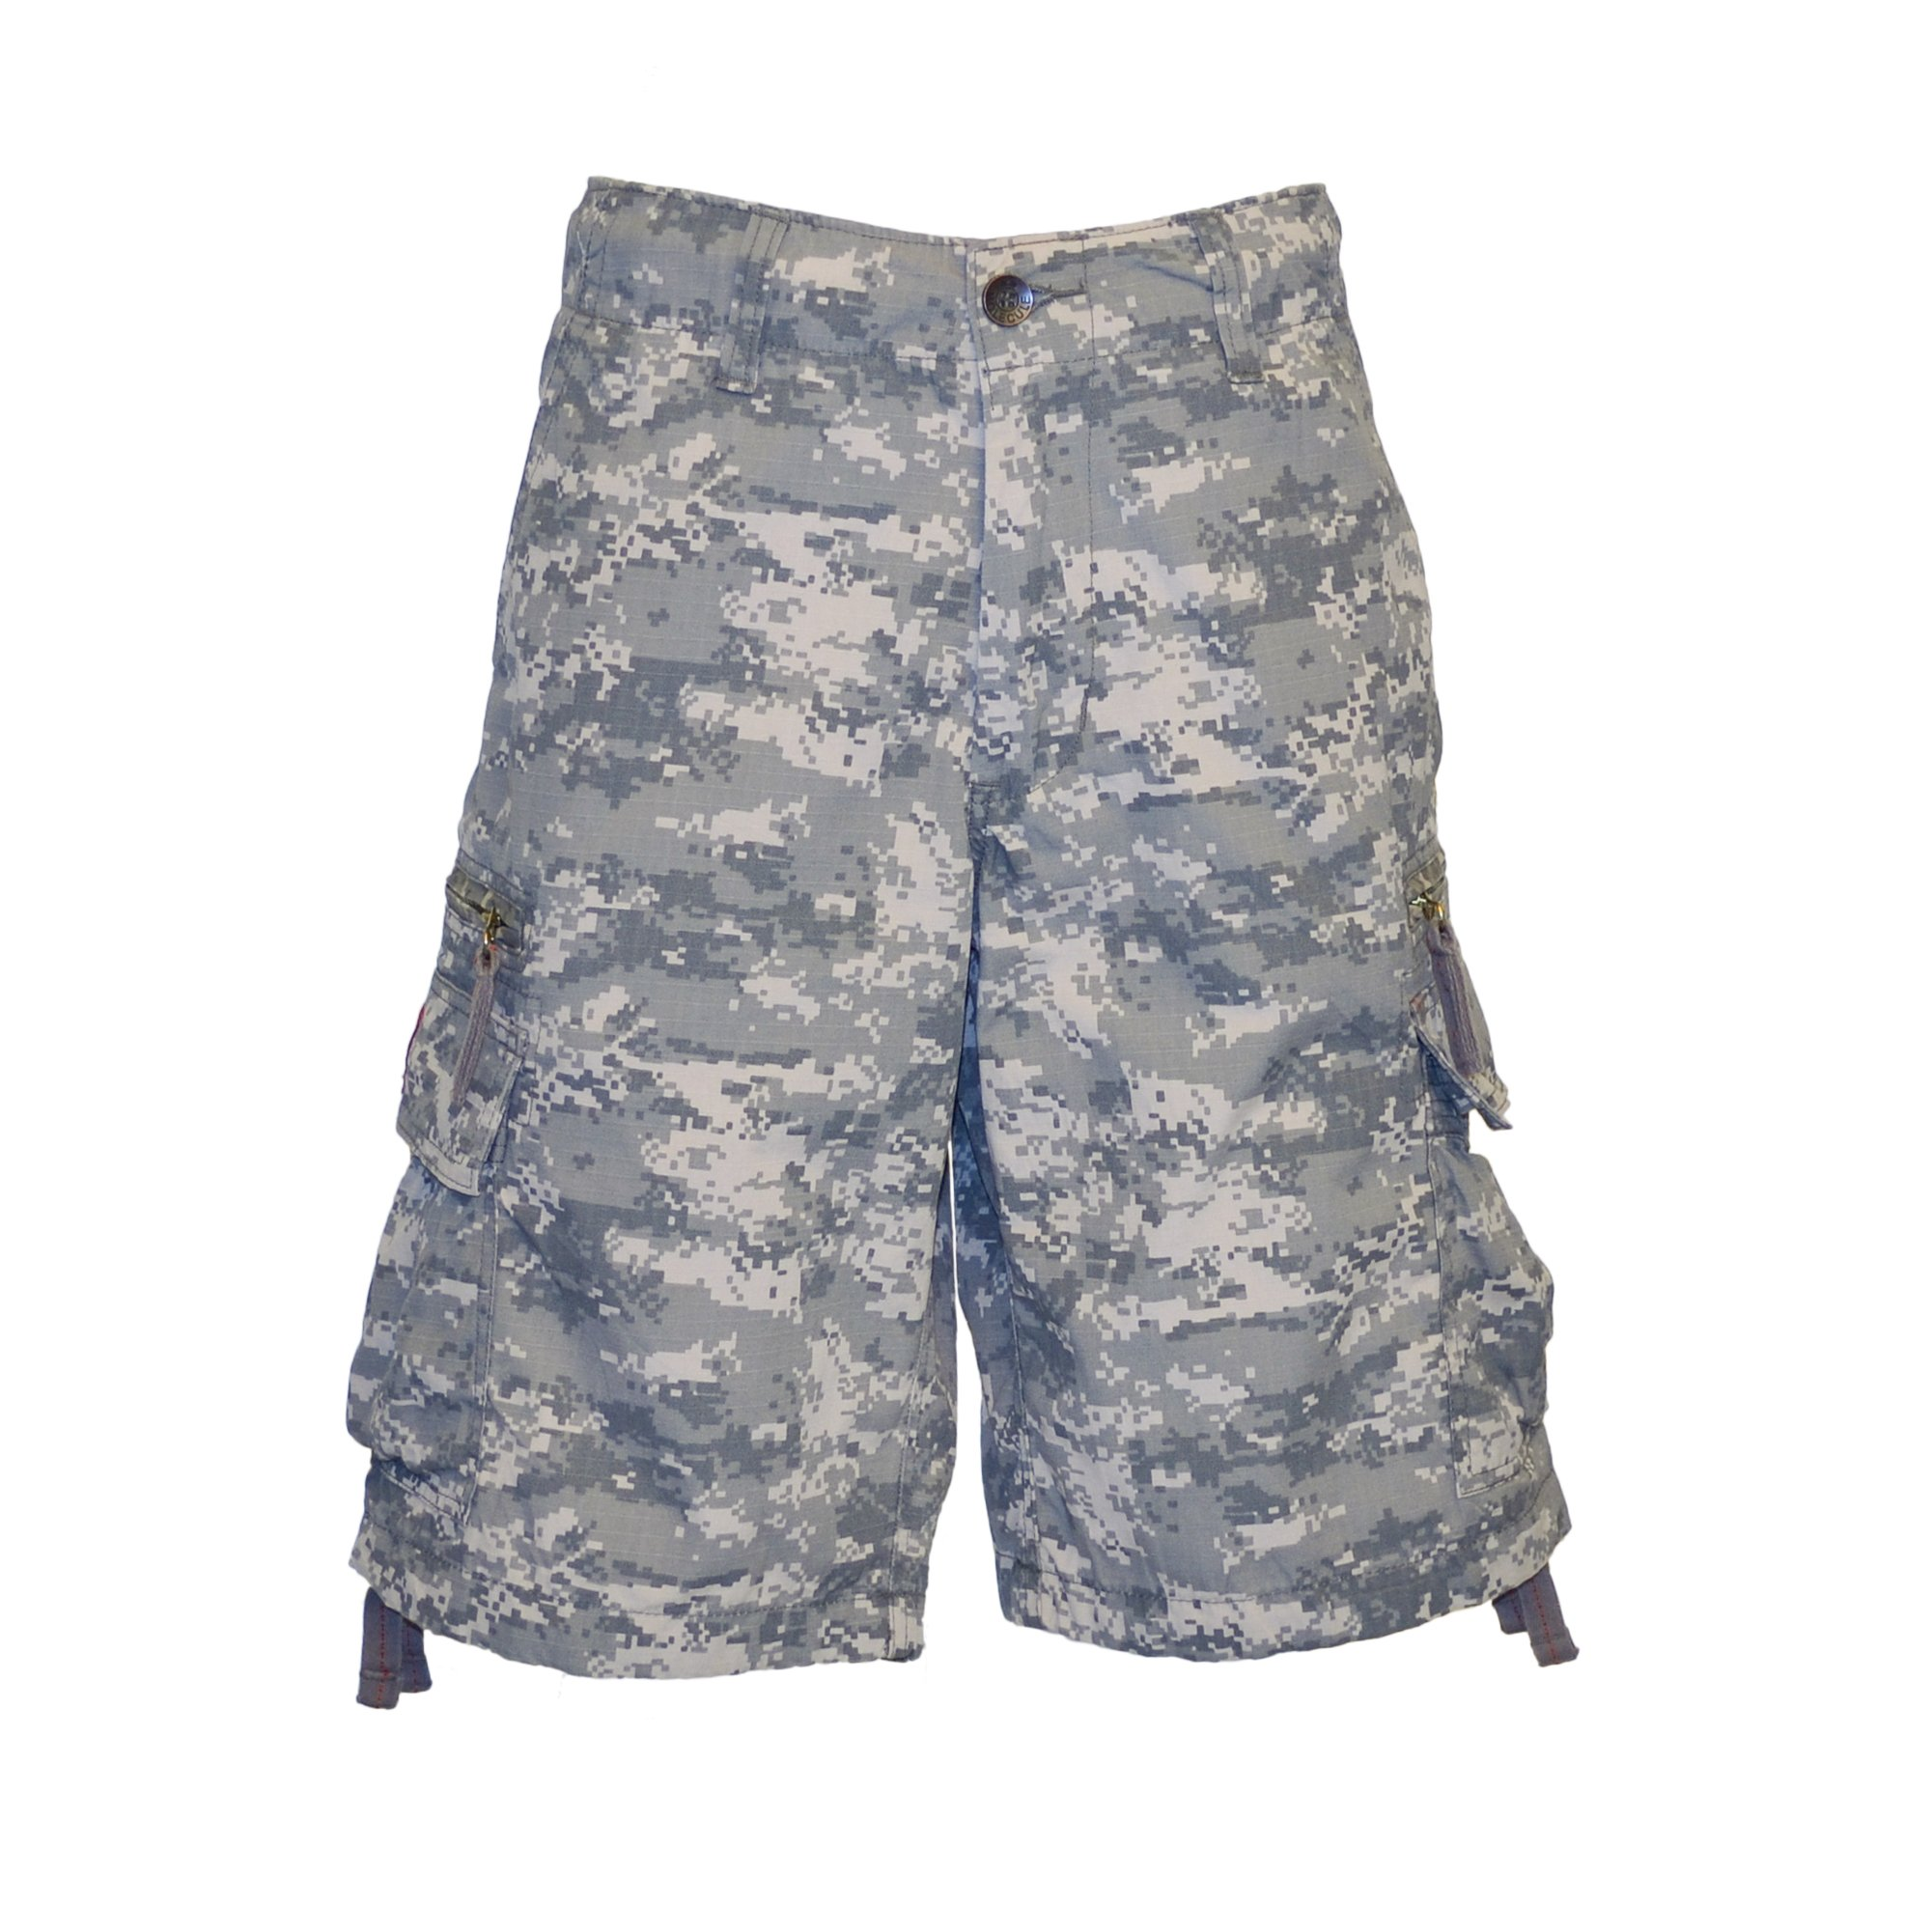 Molecule Men's Zipped Railers Cargo Shorts - Lightweight Cotton, Zipped Pockets | USA 31''/S (Tag M) Univ Camo